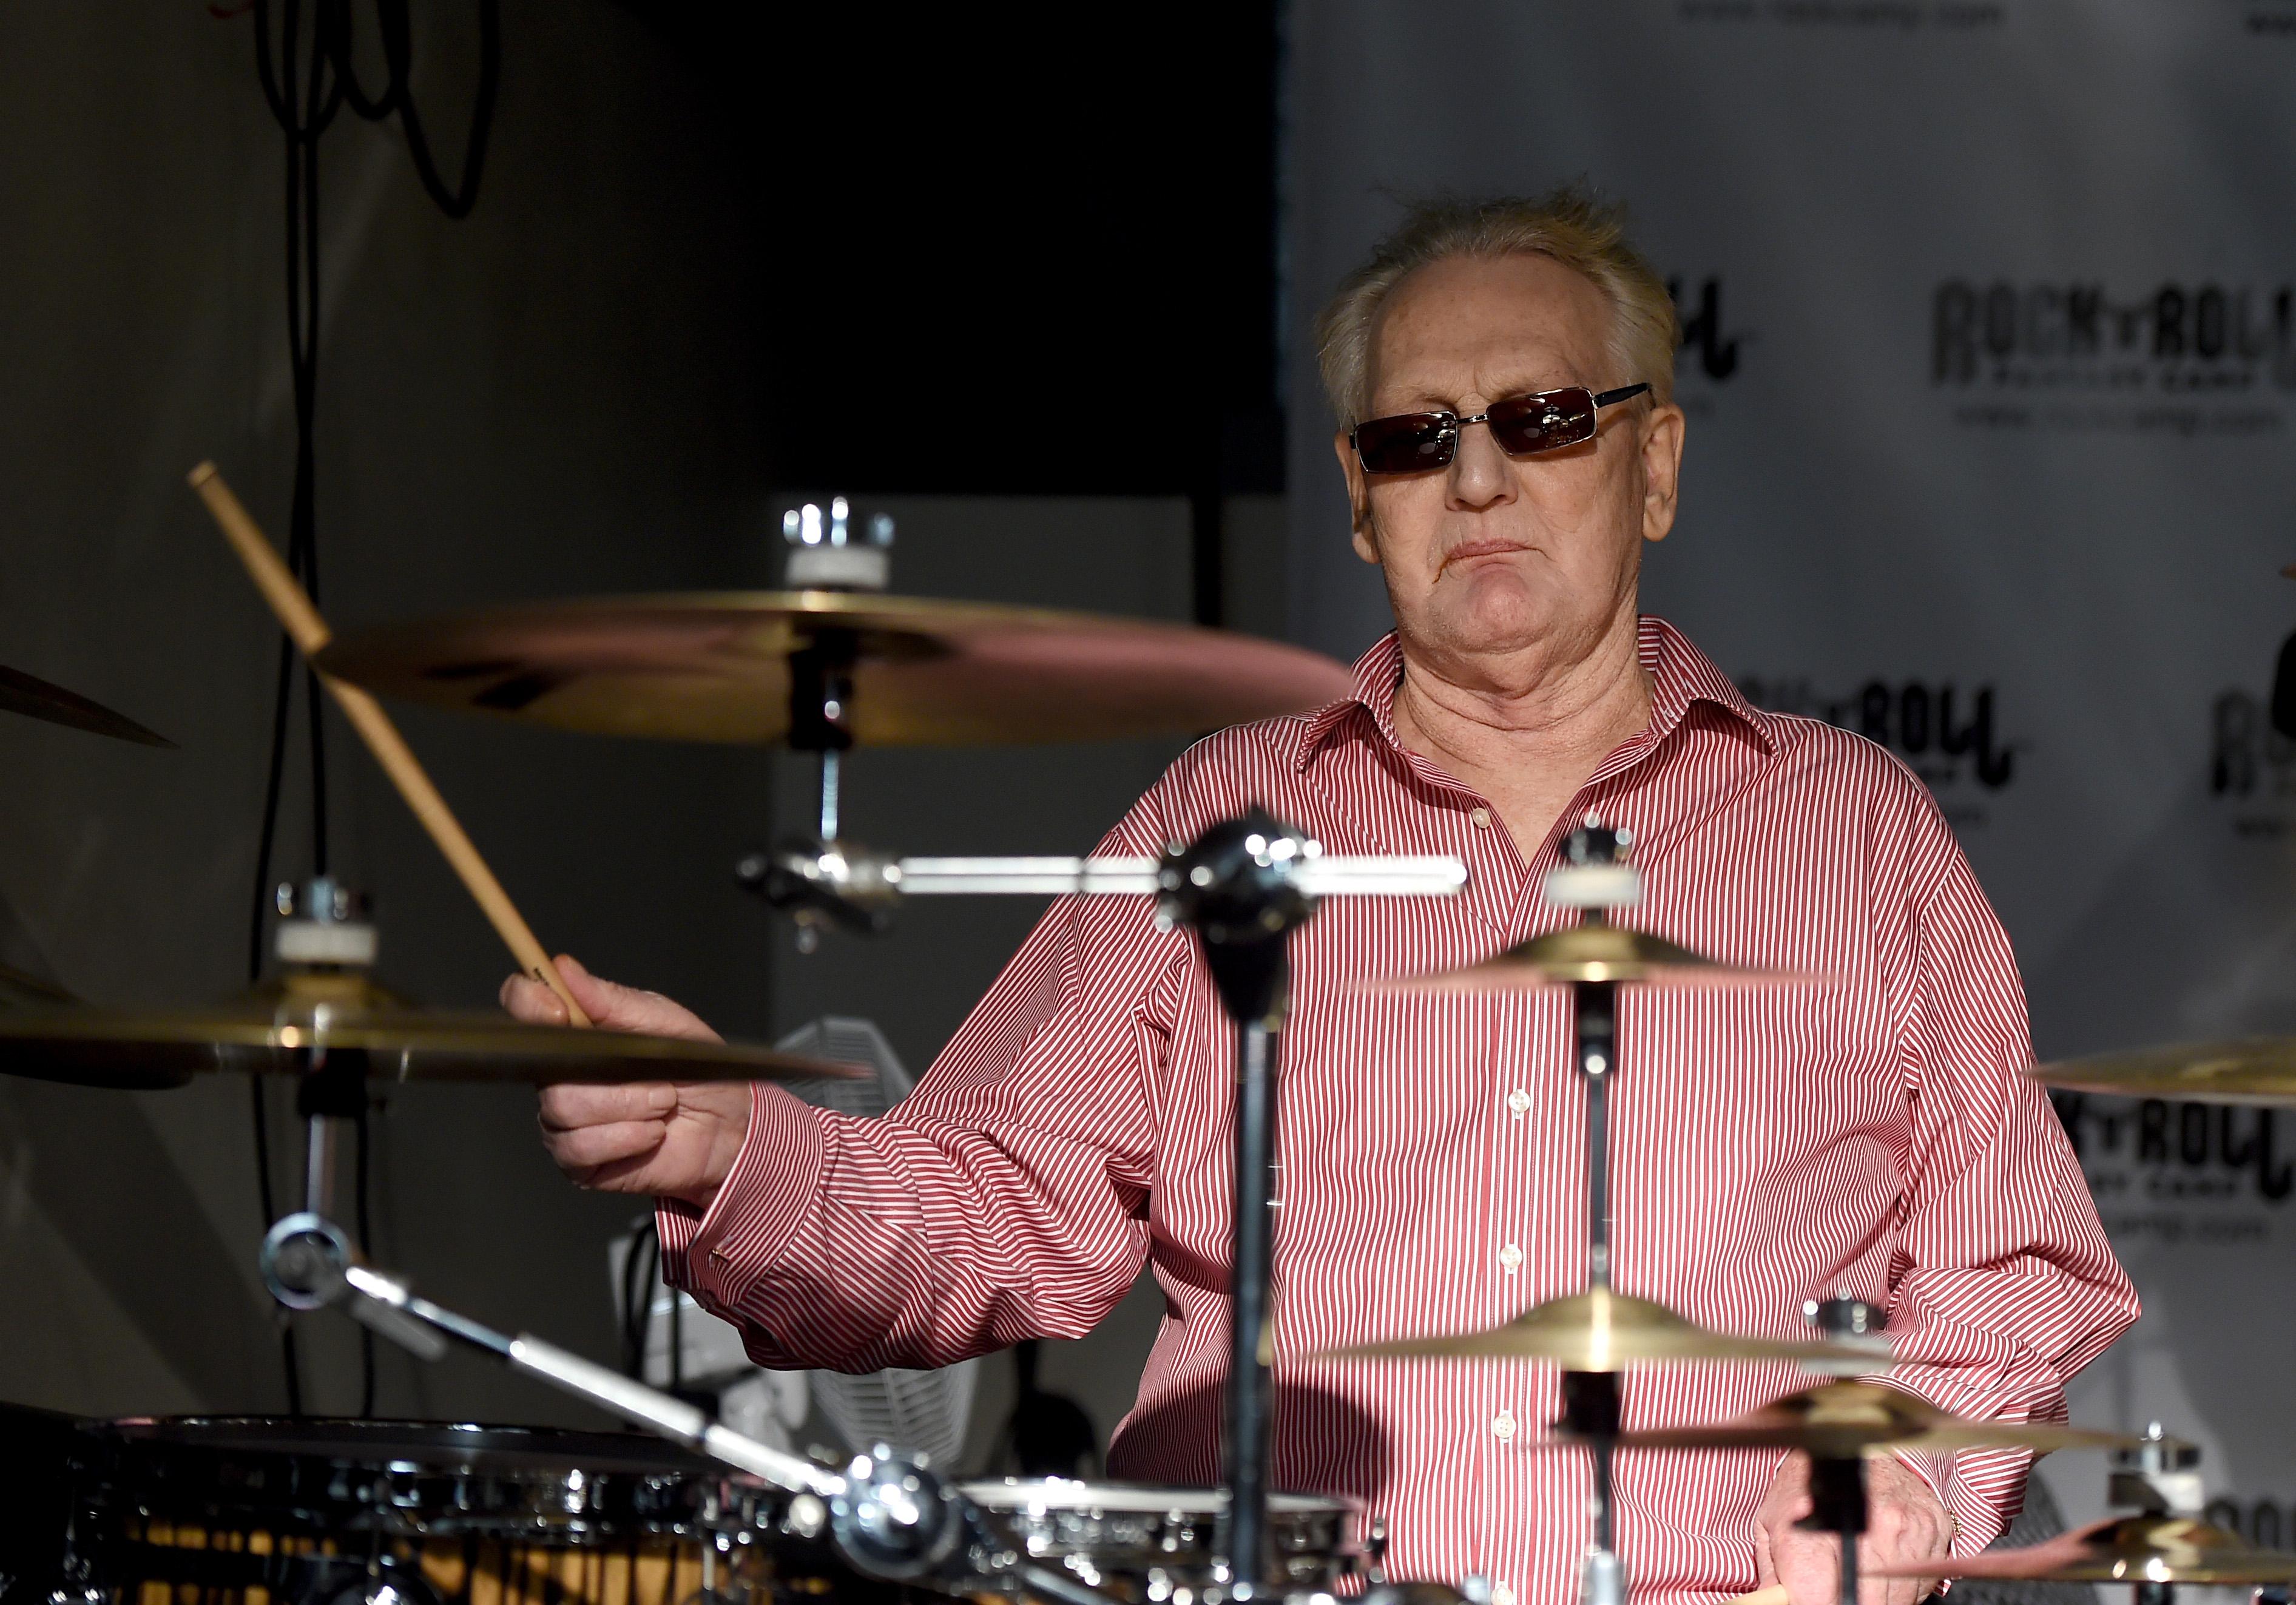 Ginger Baker, drummer with legendary rock band Cream, dies aged 80